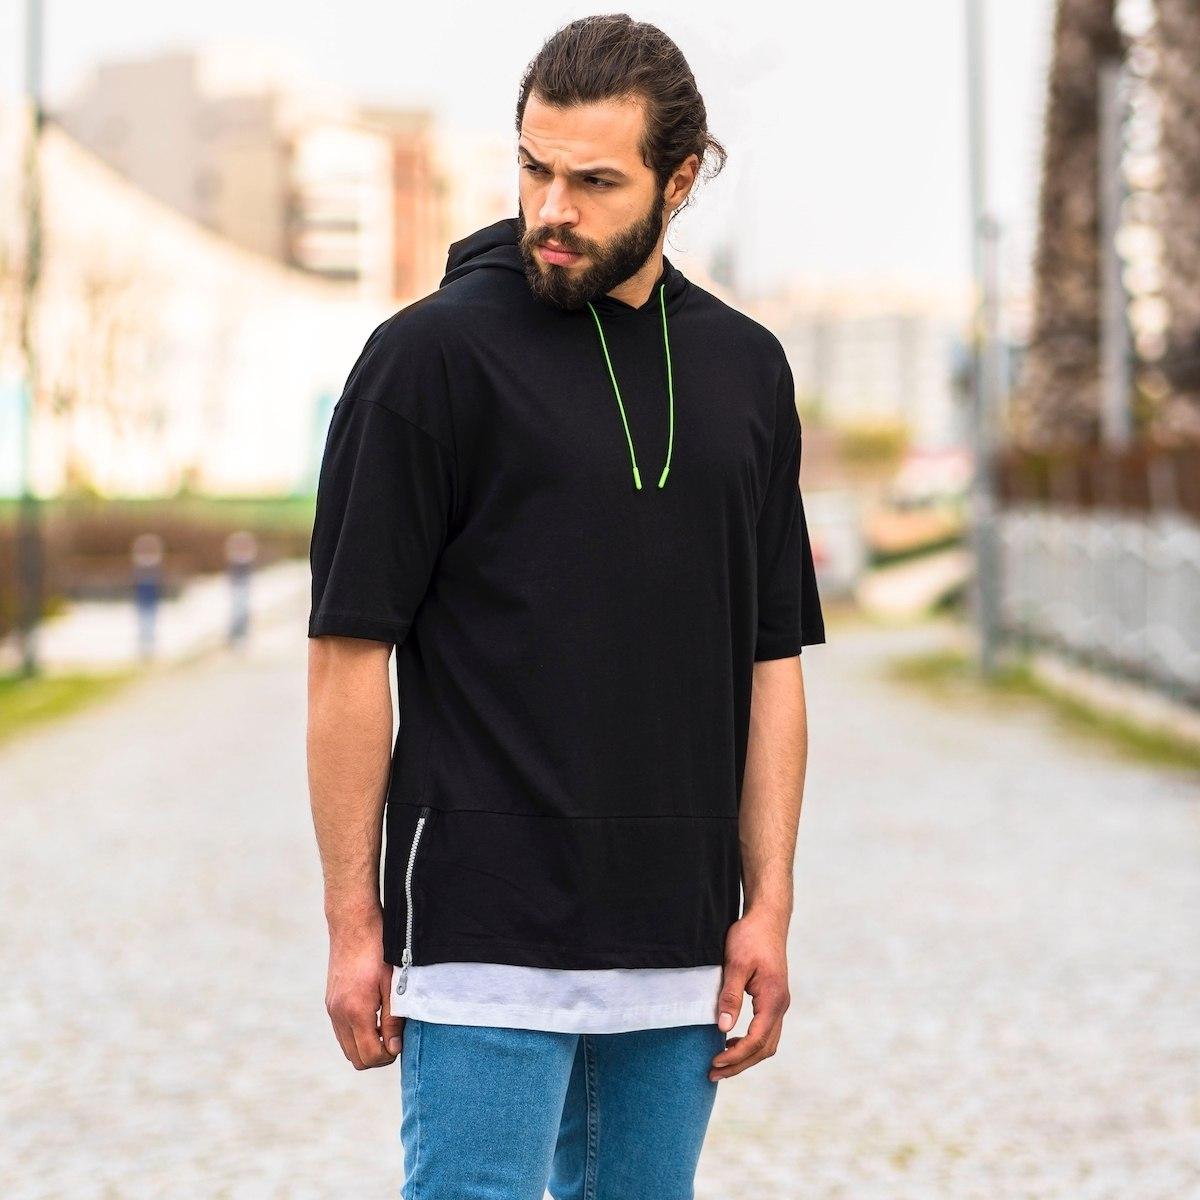 Men's Double Tailed Oversize Half-Sleeve Hoodie In Black